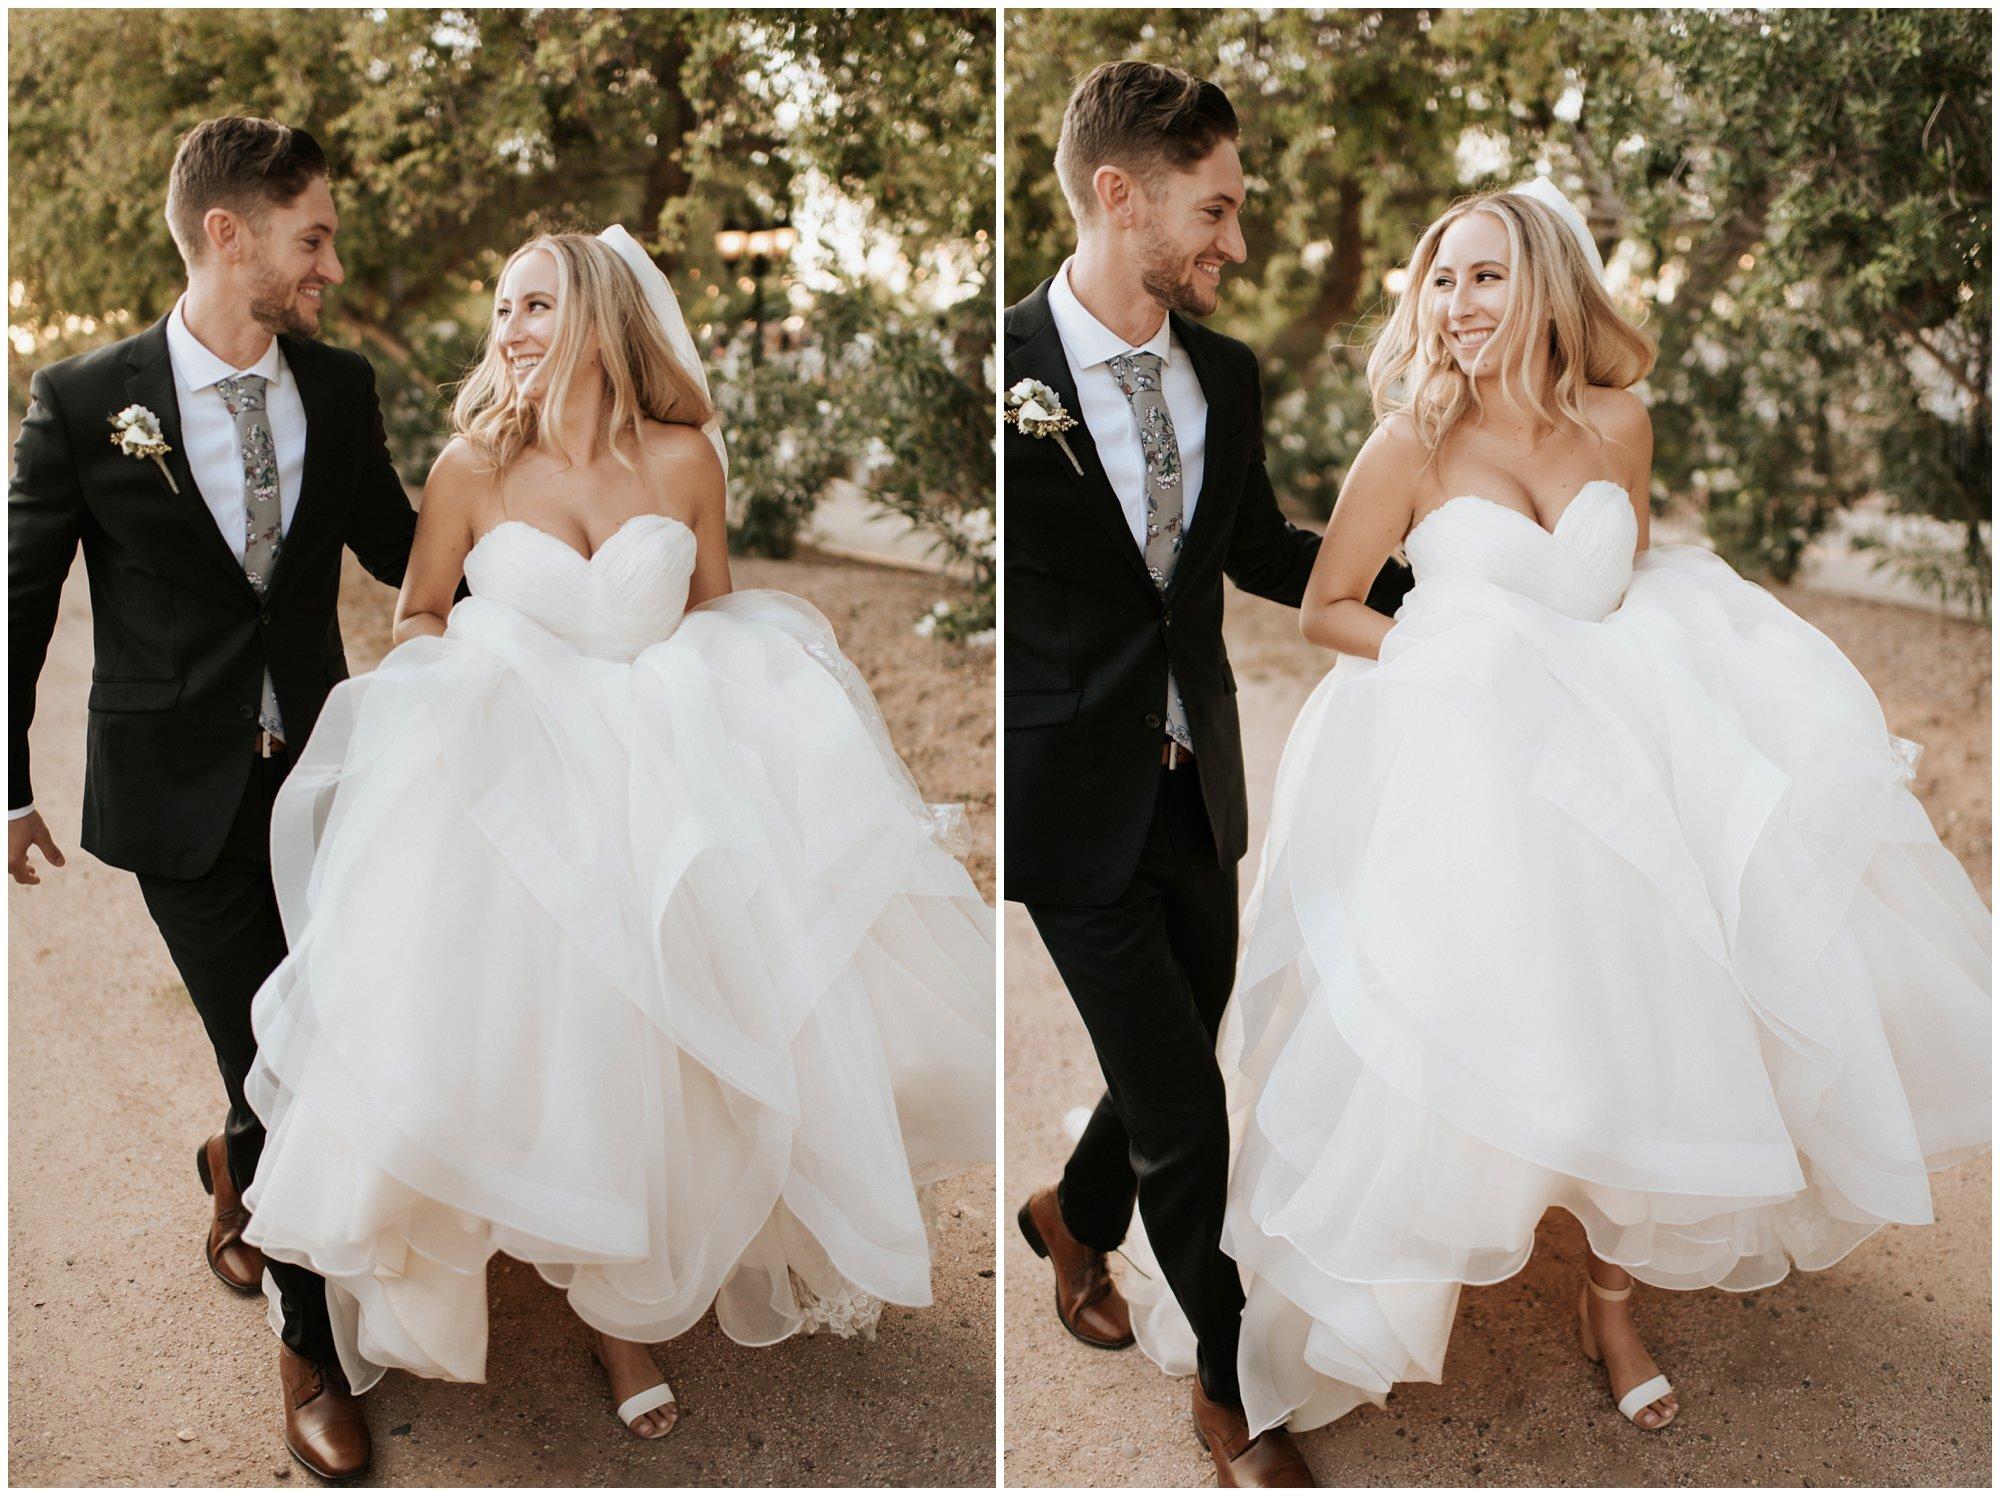 Wedgewood_Lindsay_Groves-Arizona-Wedding-Photographer-M+C_0053.jpg